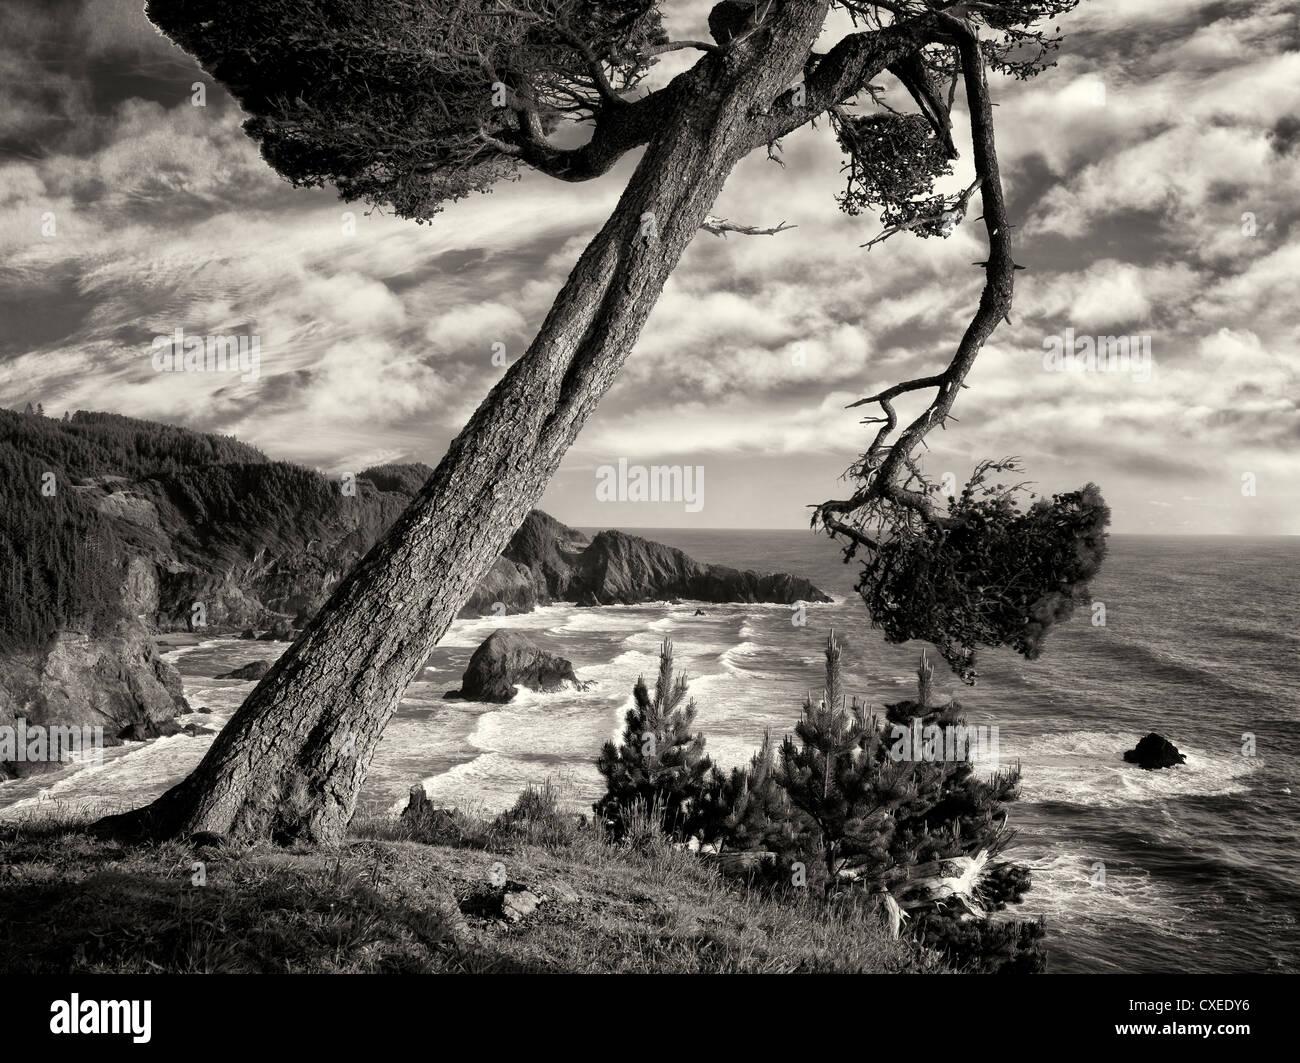 Overhanging tree and surf at Samuel H. Boardman State Scenic Corridor. Oregon - Stock Image